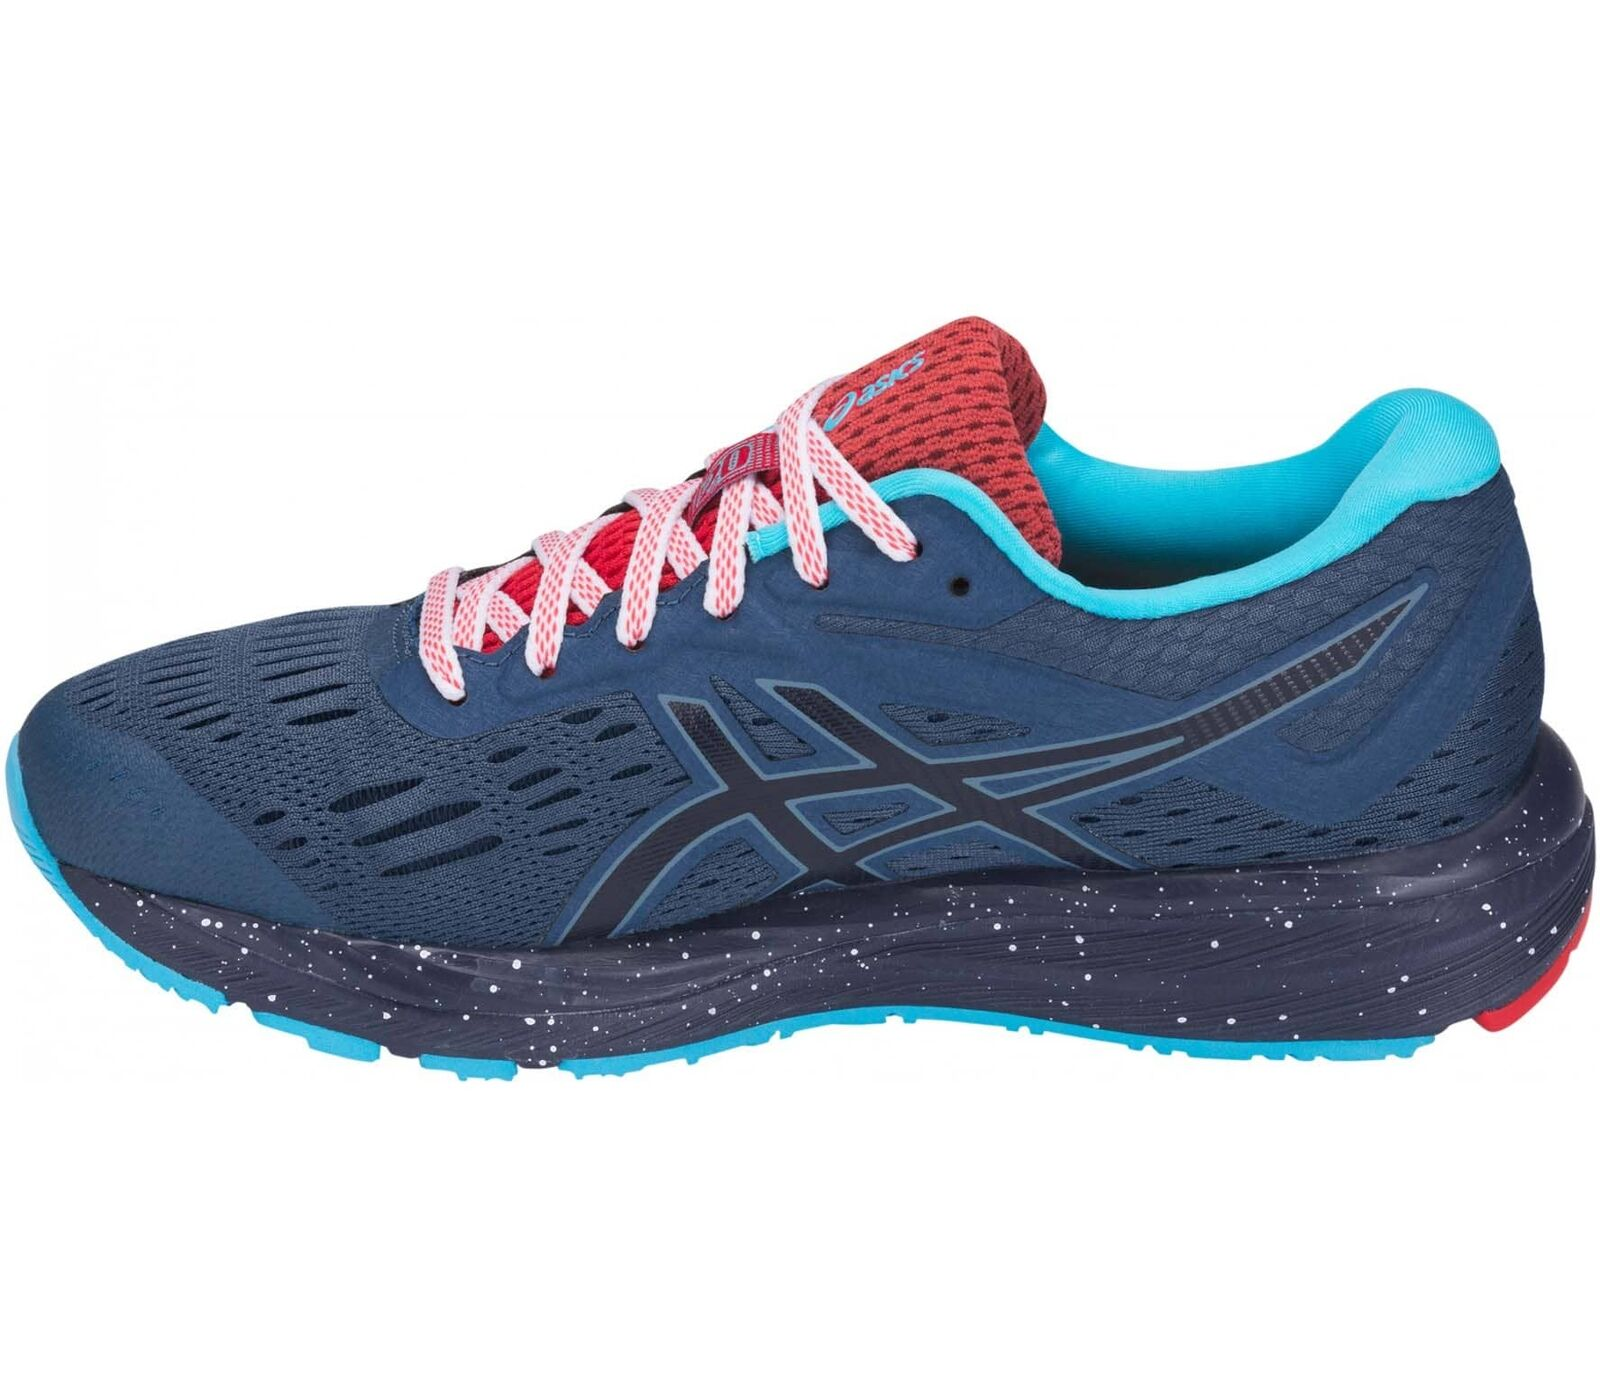 Asics Gel Cumulus 20 LE shoes Running women 1012A218-400